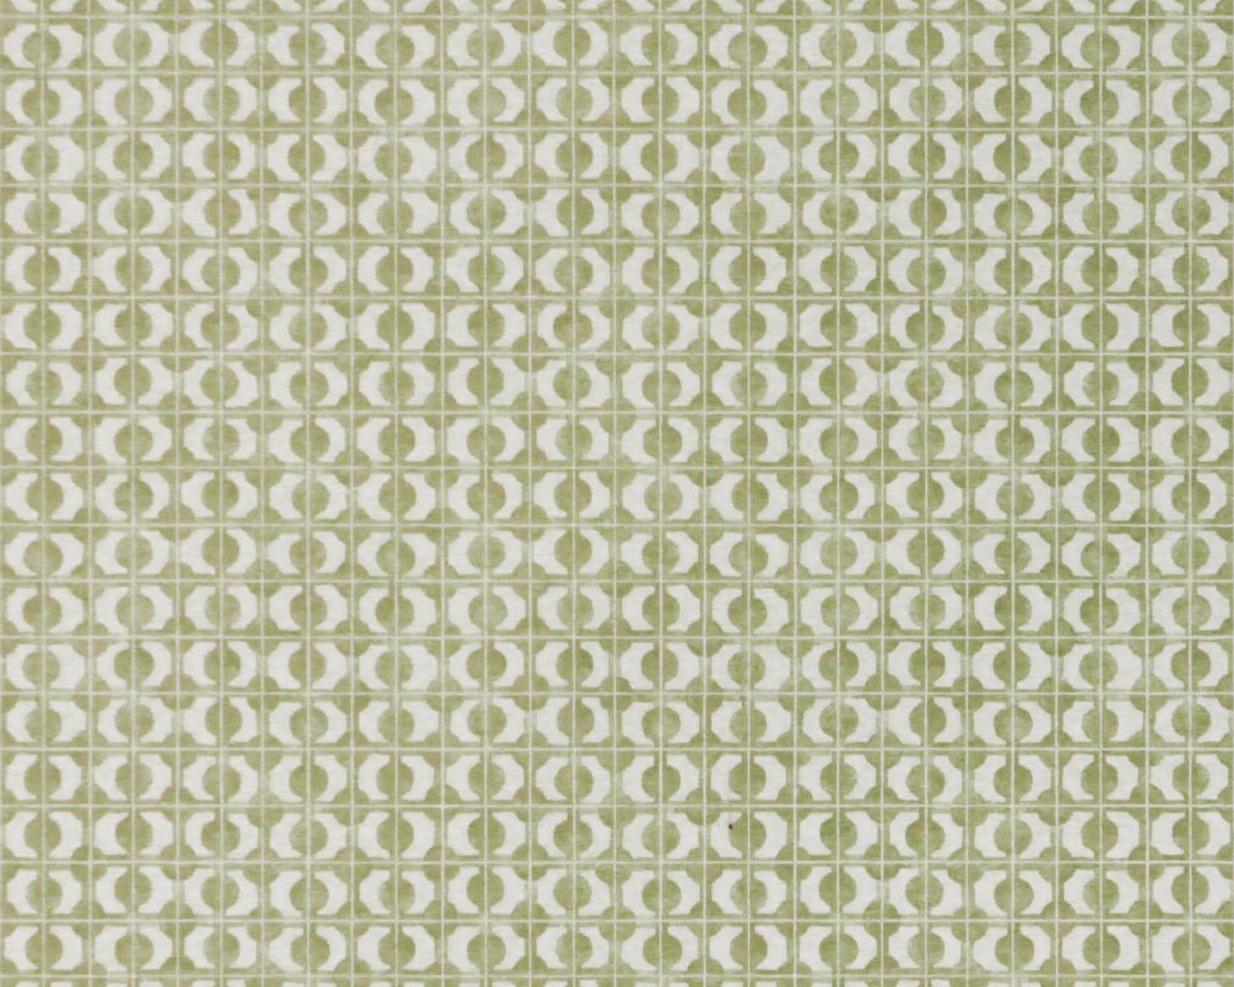 Seto Mini - Spring Wallpaper detail